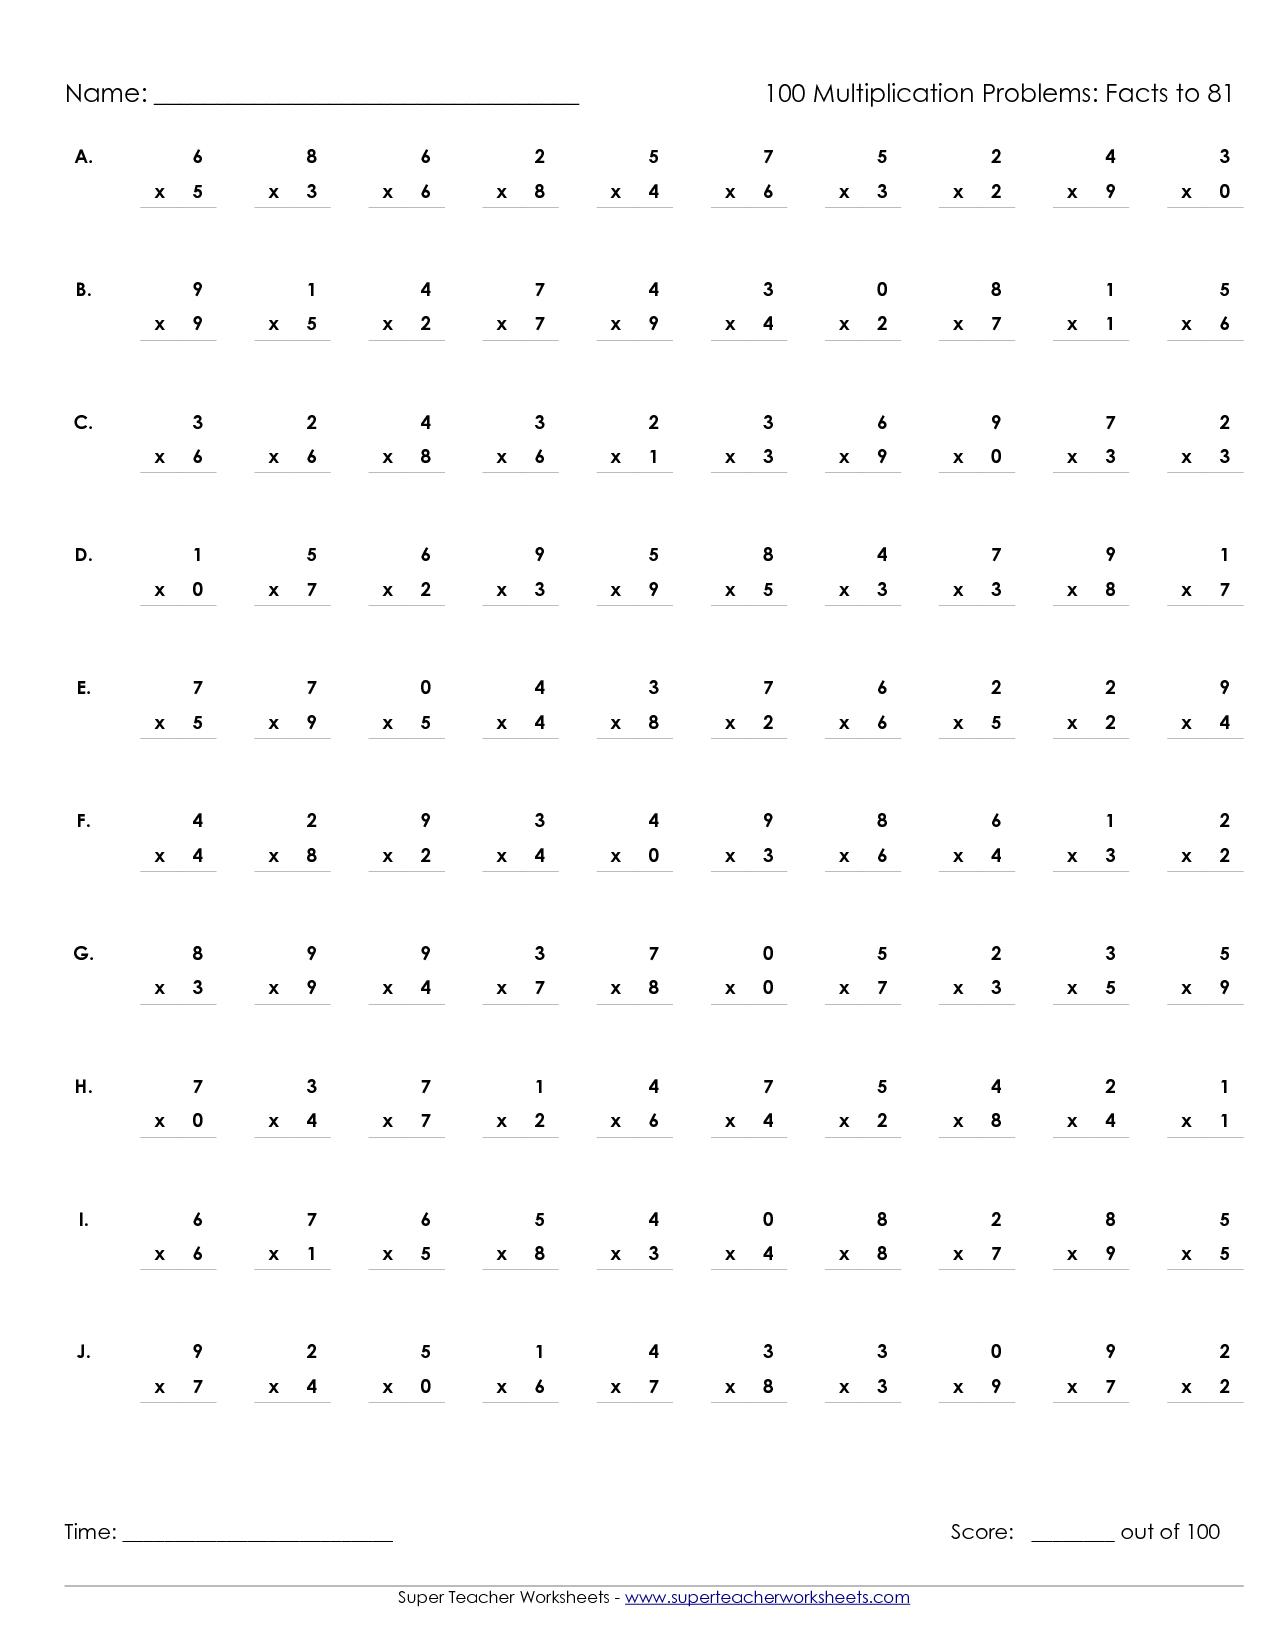 Multiplication Worksheets 5th Grade 100 Problems